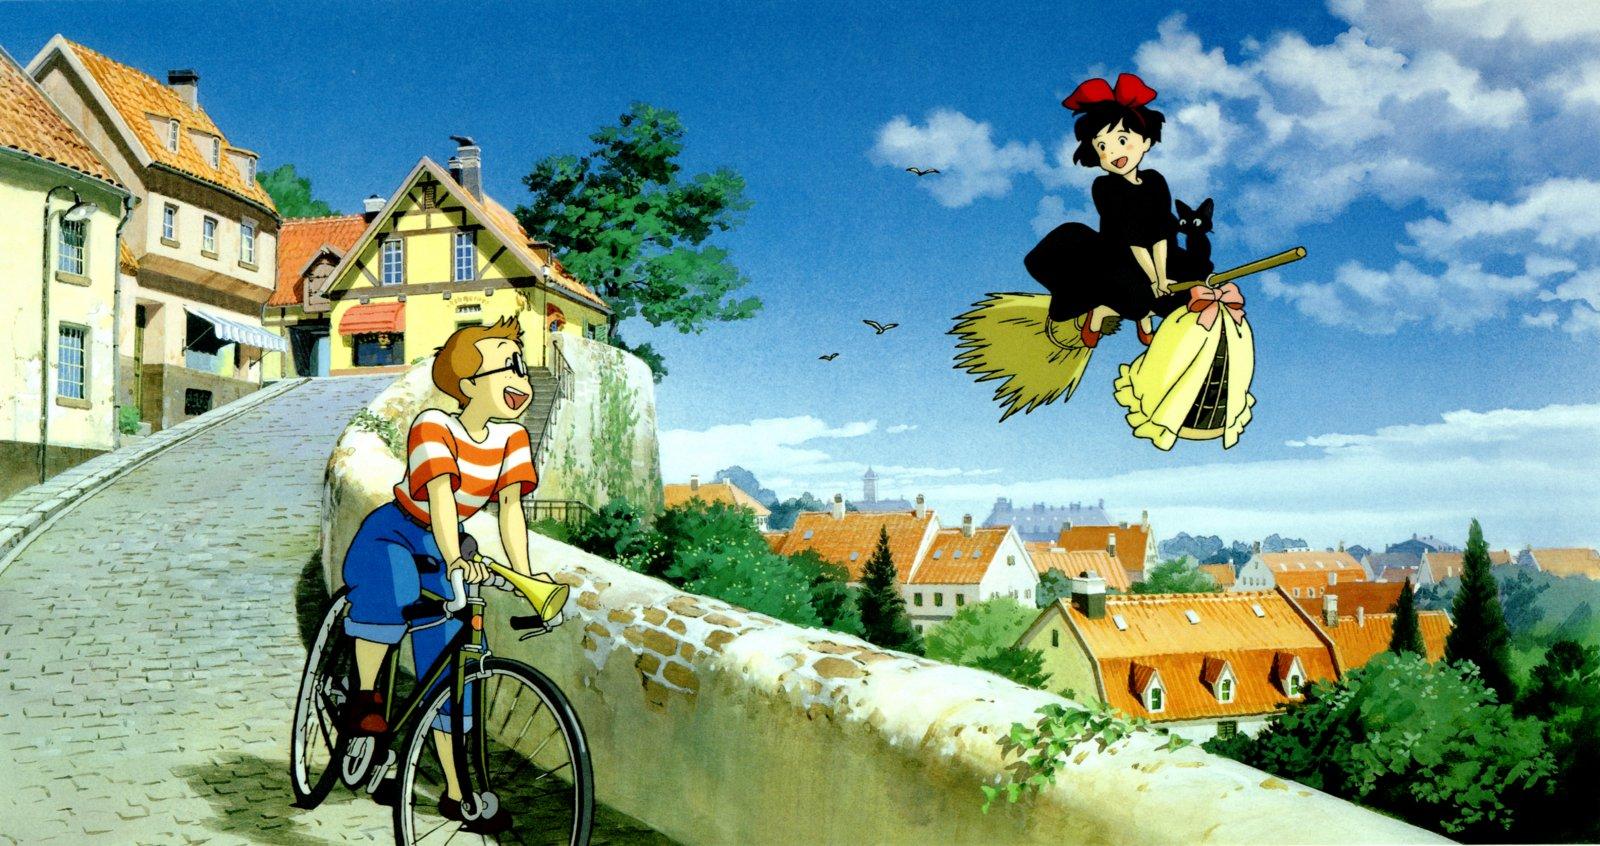 Studio Ghibli Wallpaper 1600x846 Kikis Delivery